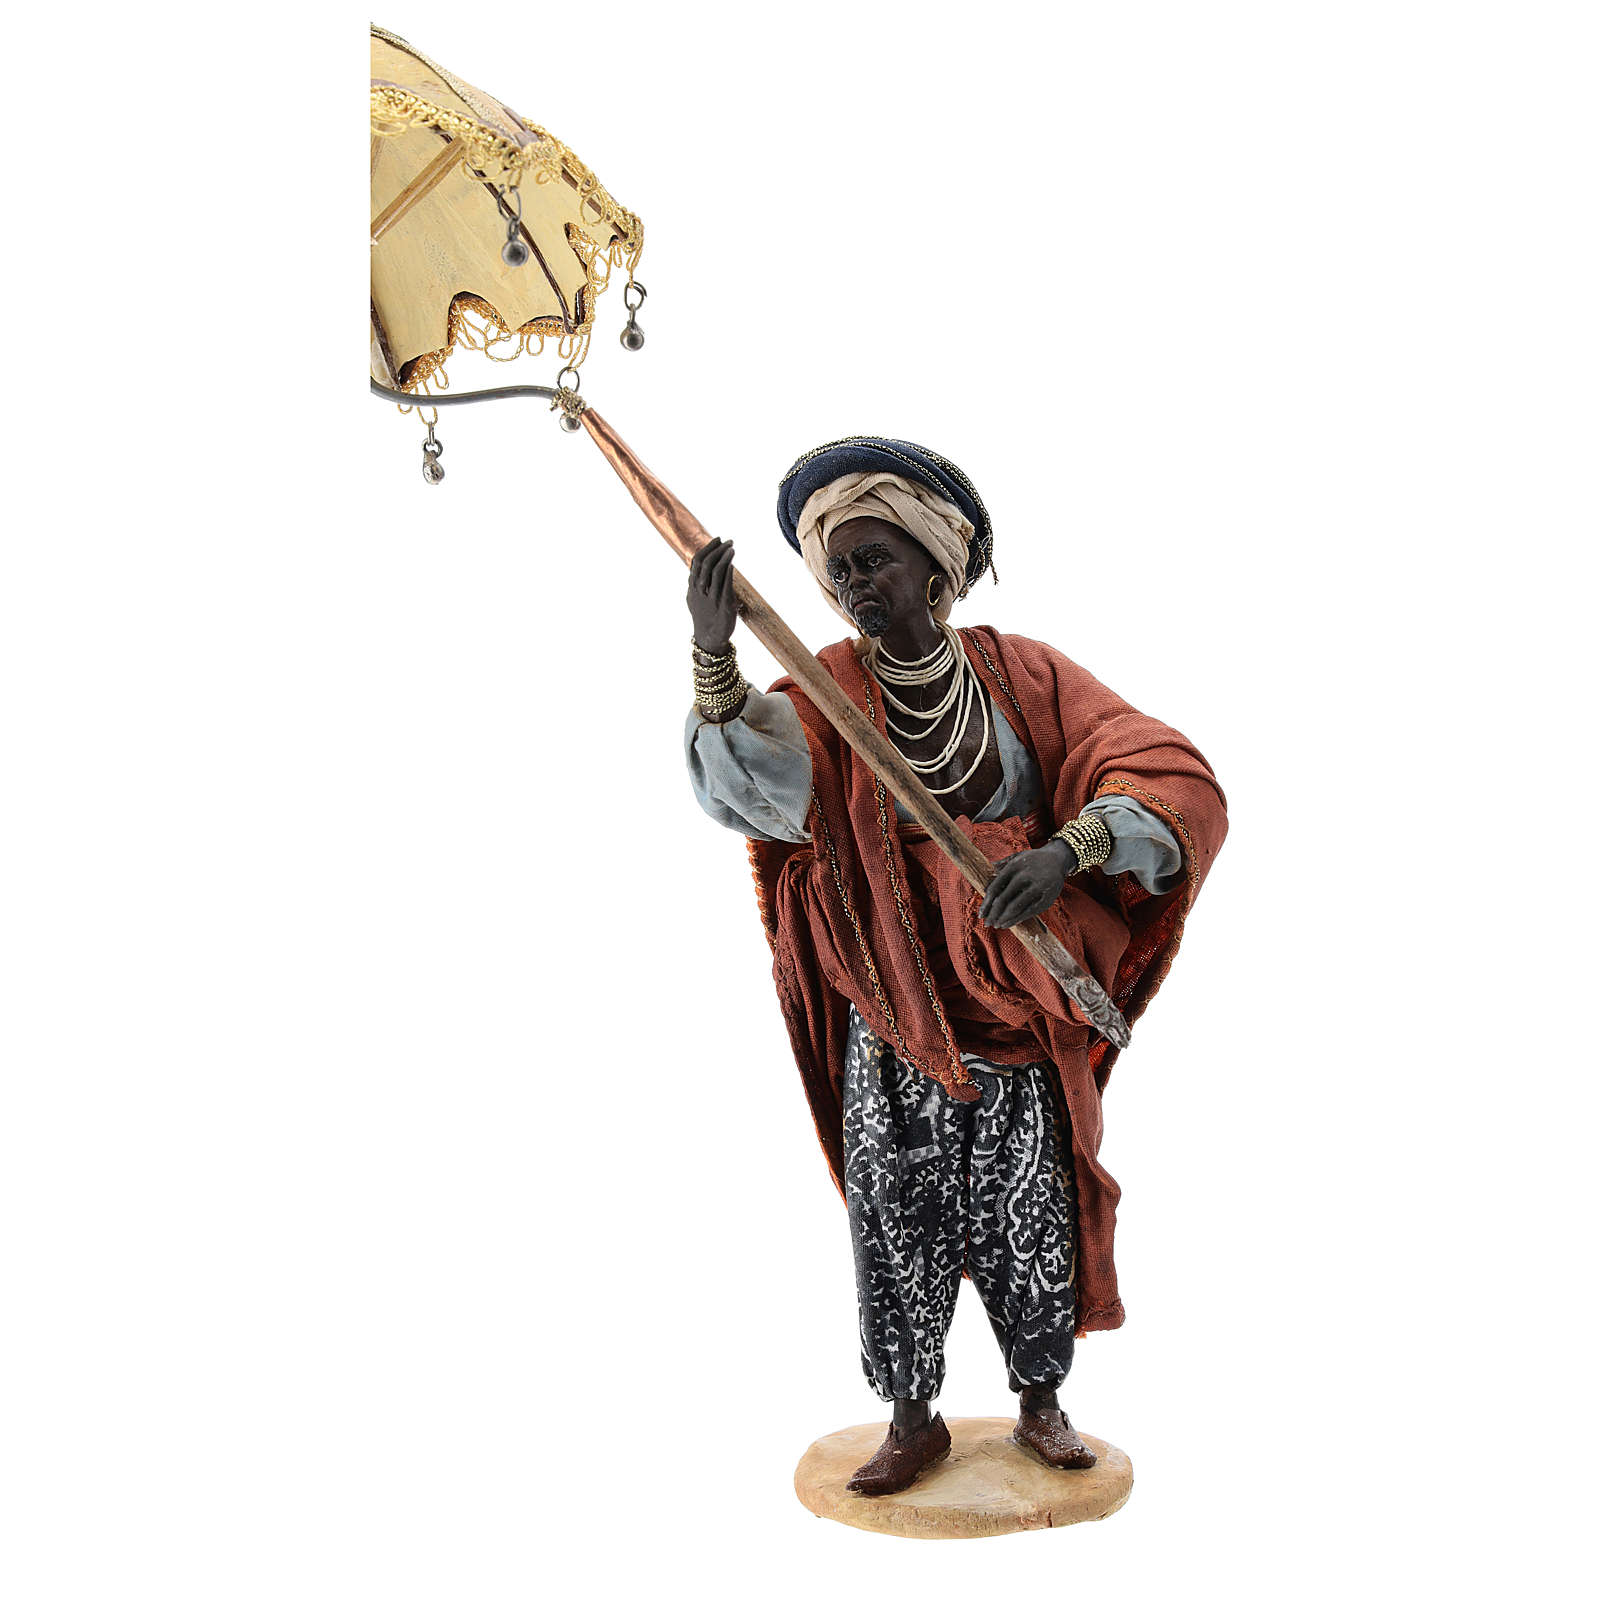 Nativity scene figurine, servant with umbrella 18 cm by Angela Tripi 4